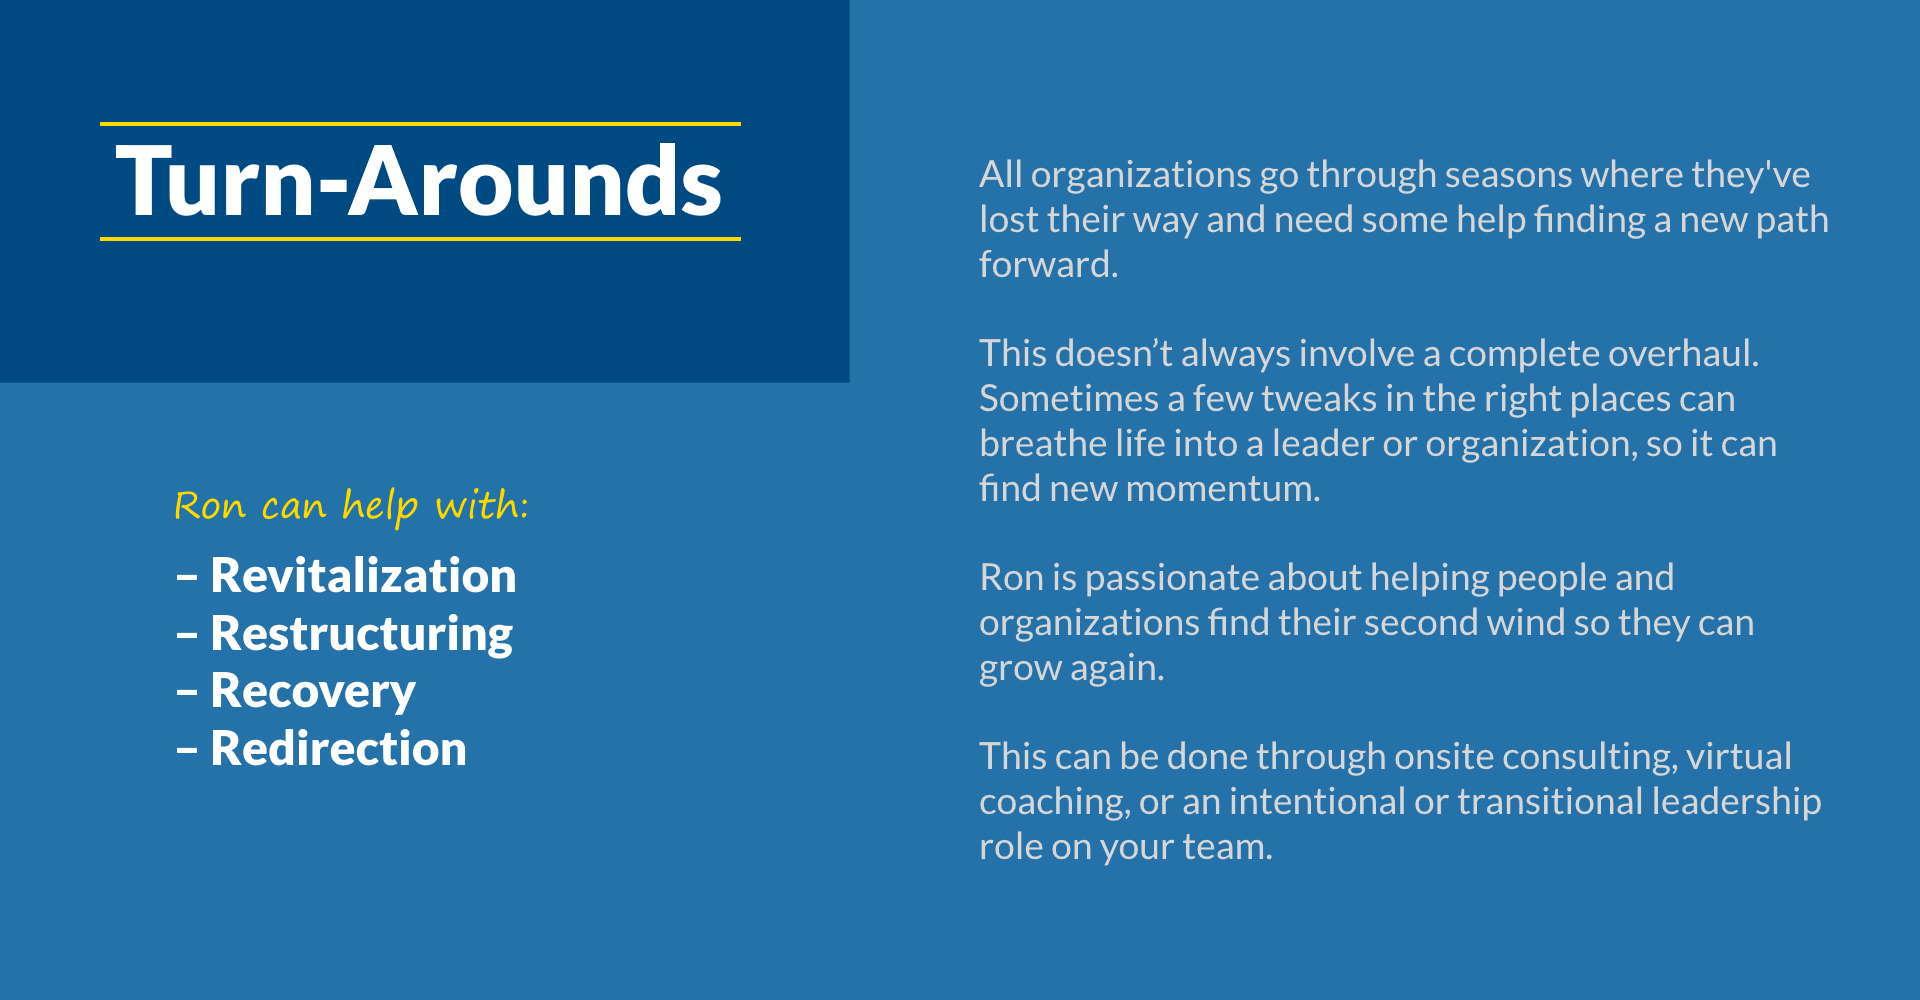 5T Leadership - Turn Arounds- Ron Edmondson Leadership Coaching